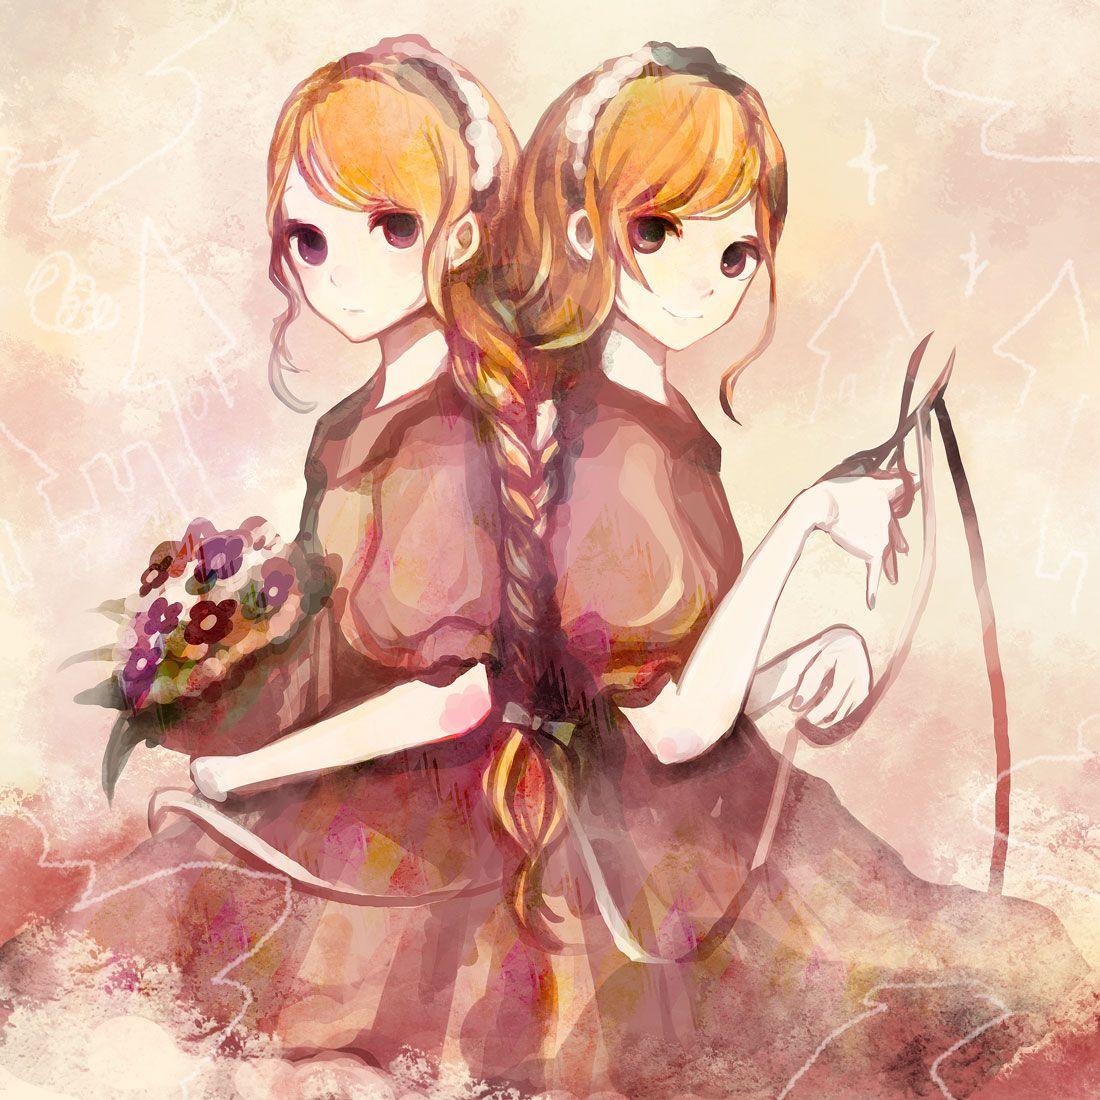 Pin By Creepypasta Girl On Pretty Anime Style Pics Animation Artwork Anime Anime Movies